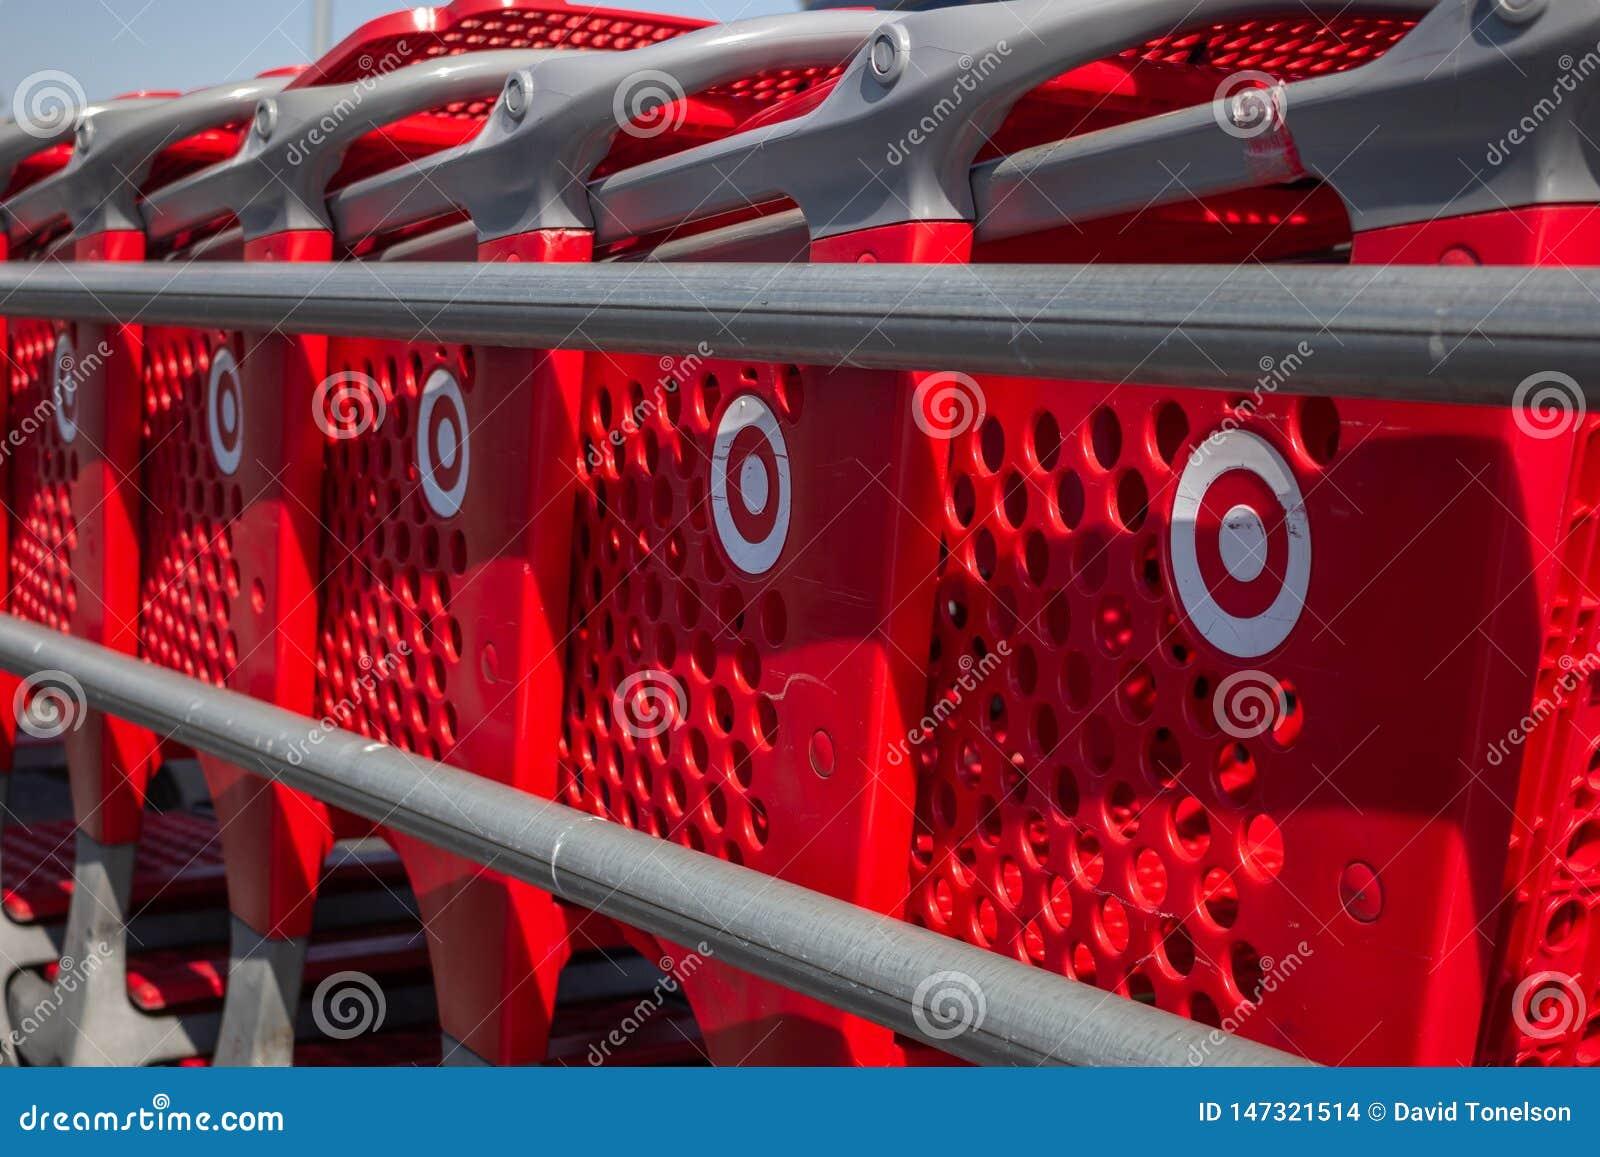 Target shoppings carts